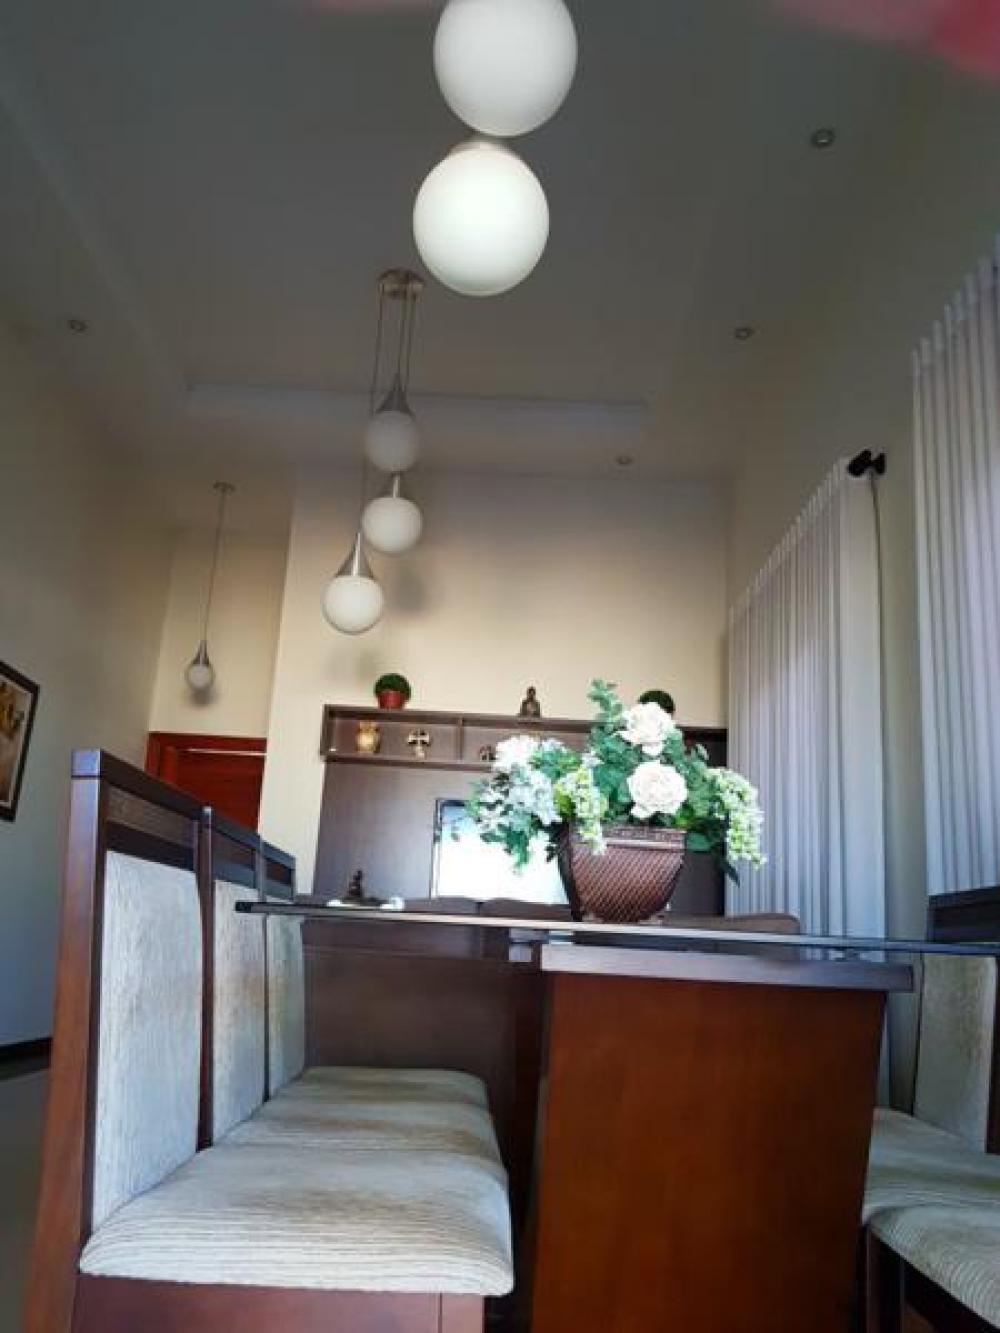 SAO JOSE DO RIO PRETO Casa Venda R$788.000,00 Condominio R$360,00 3 Dormitorios 4 Vagas Area do terreno 400.00m2 Area construida 185.00m2